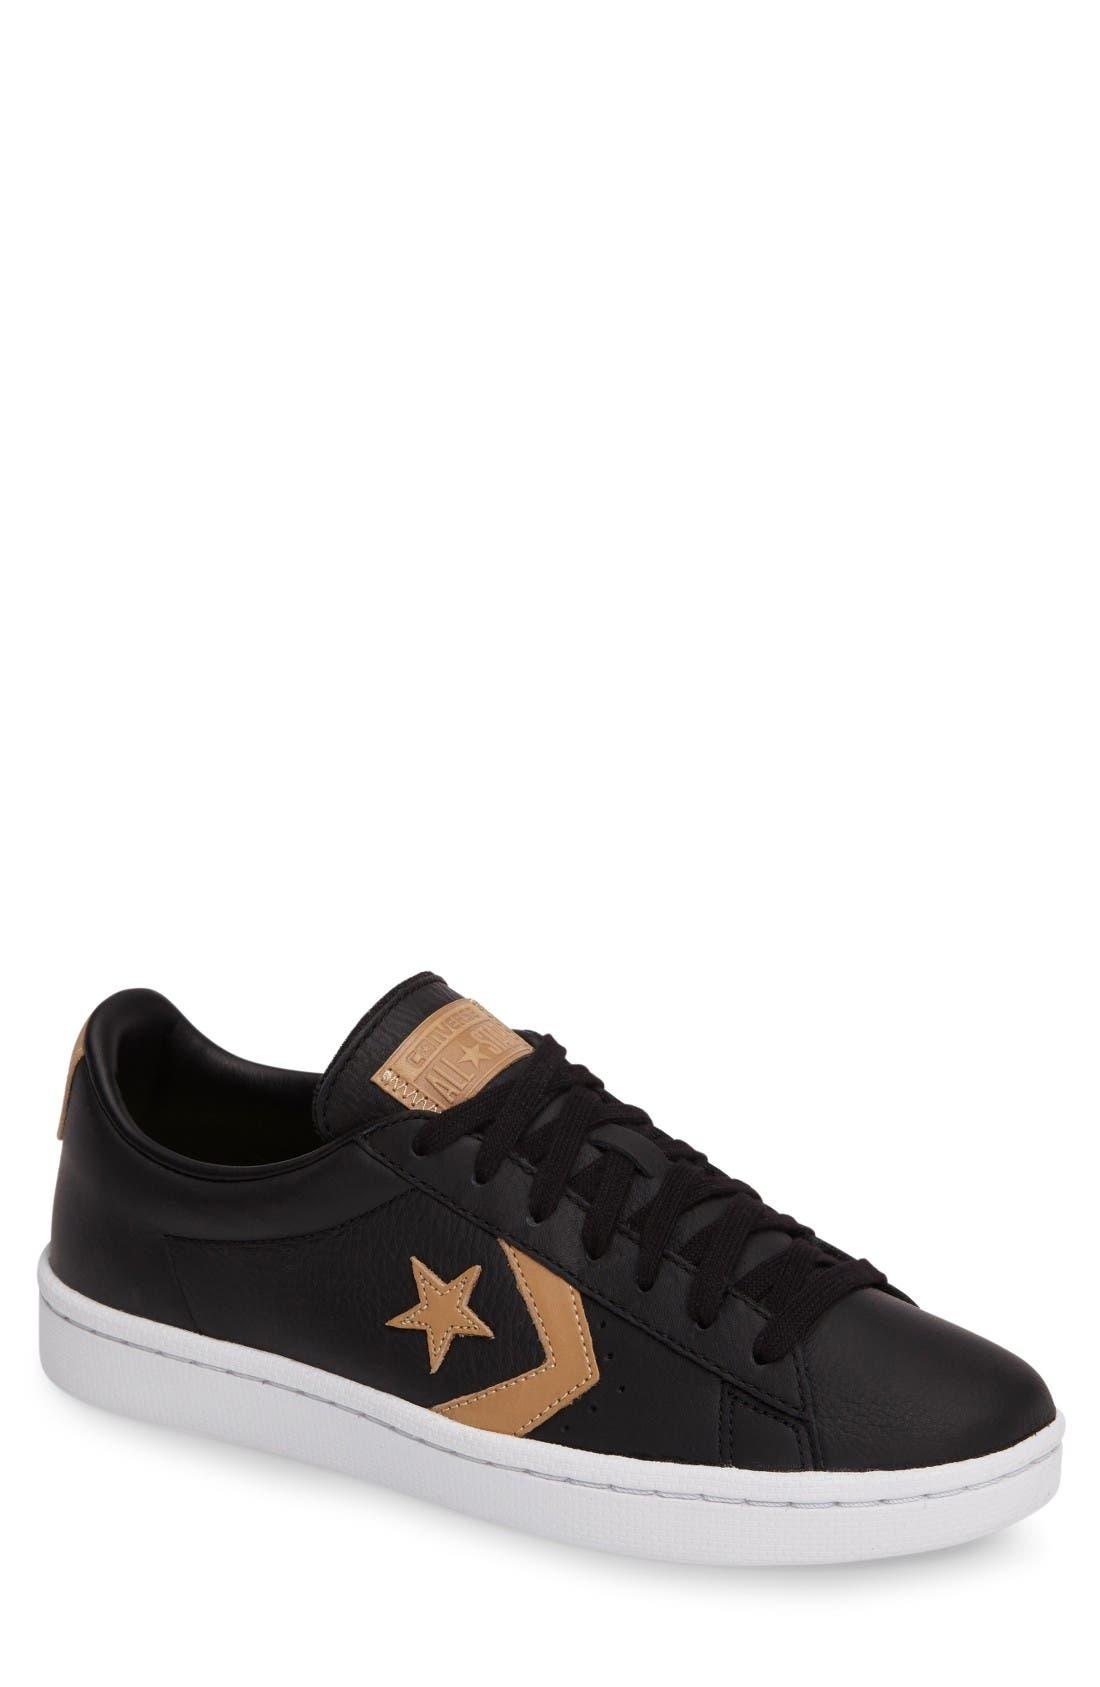 CONVERSE PL 76 Ox Sneaker